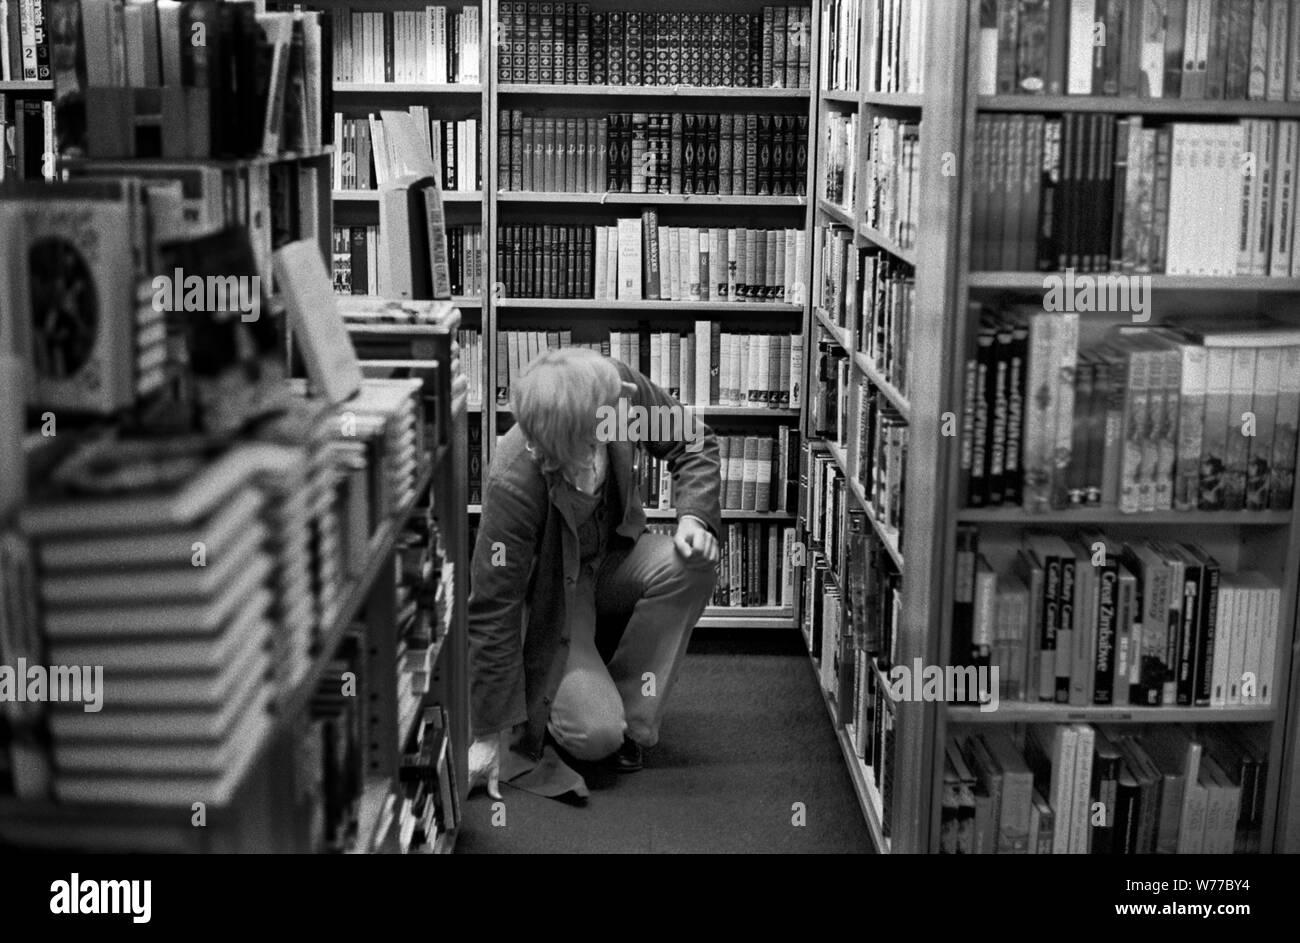 1970 Libro tiendas gente navega seleccionando libros atestada ocupado London Book Shop 70s UK HOMER SYKES Foto de stock